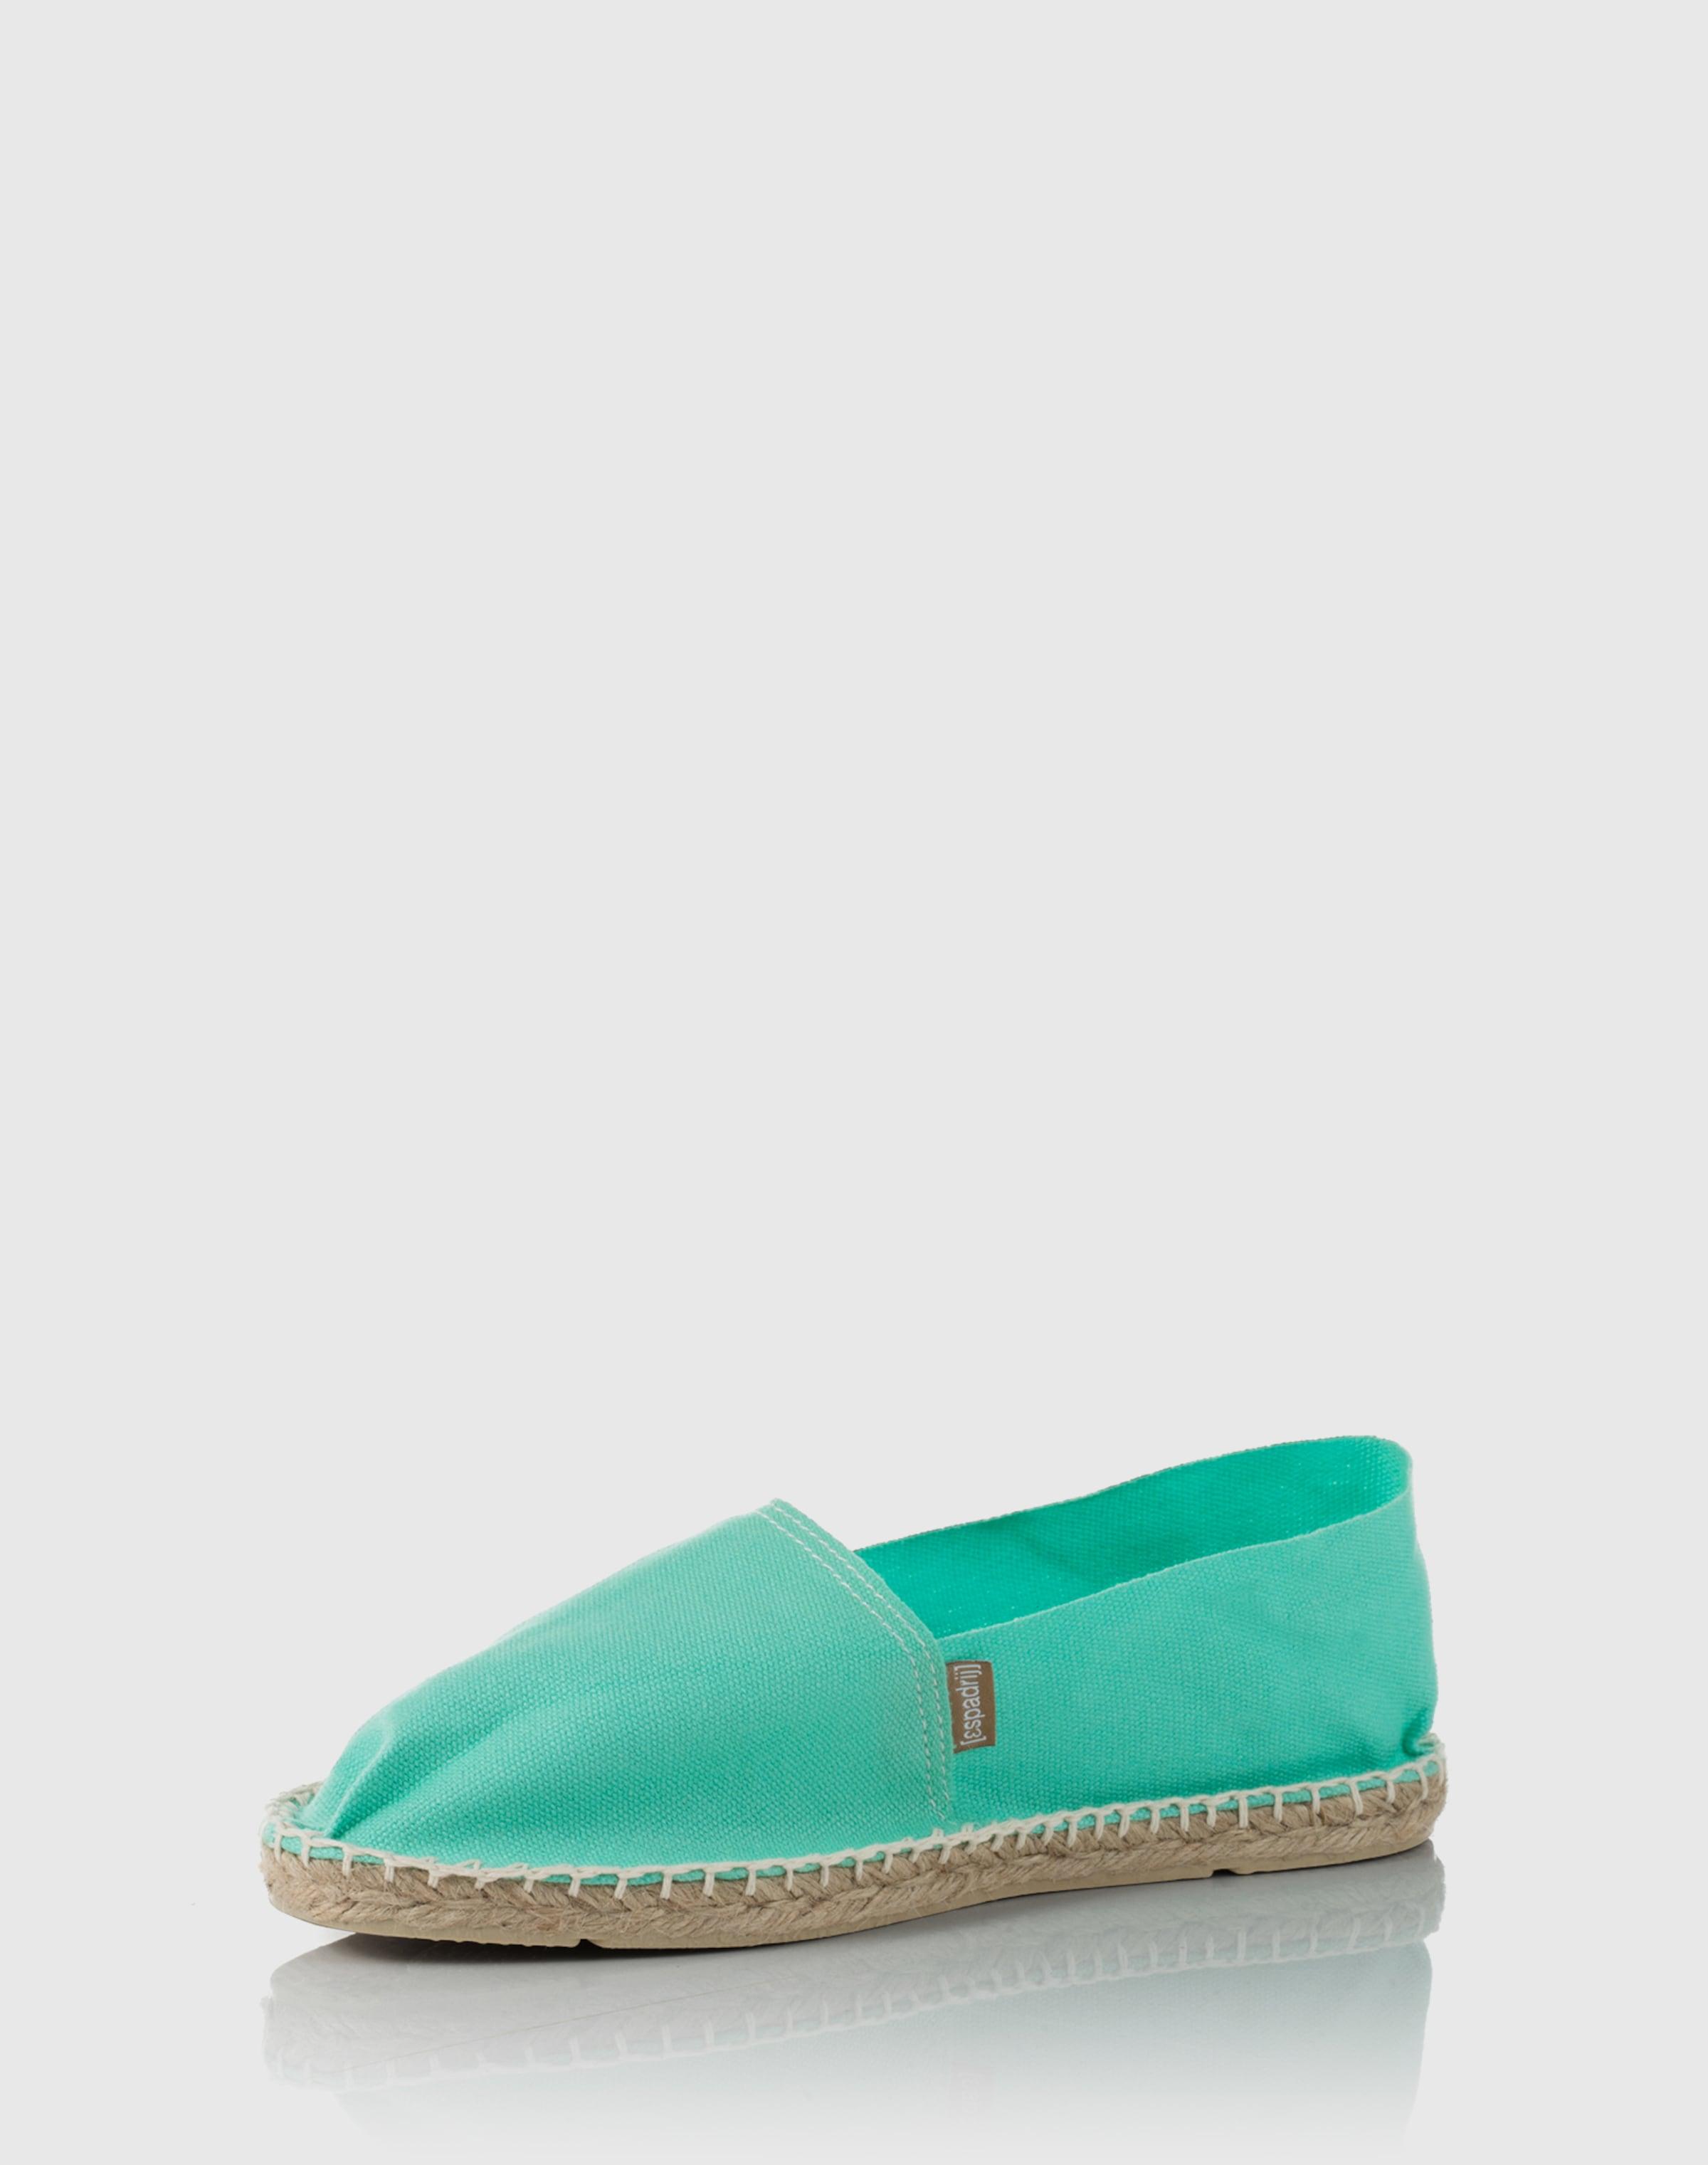 espadrij l´originale | Espadrilles mit gummierter Sohle 'Classic' Schuhe Gut getragene Schuhe